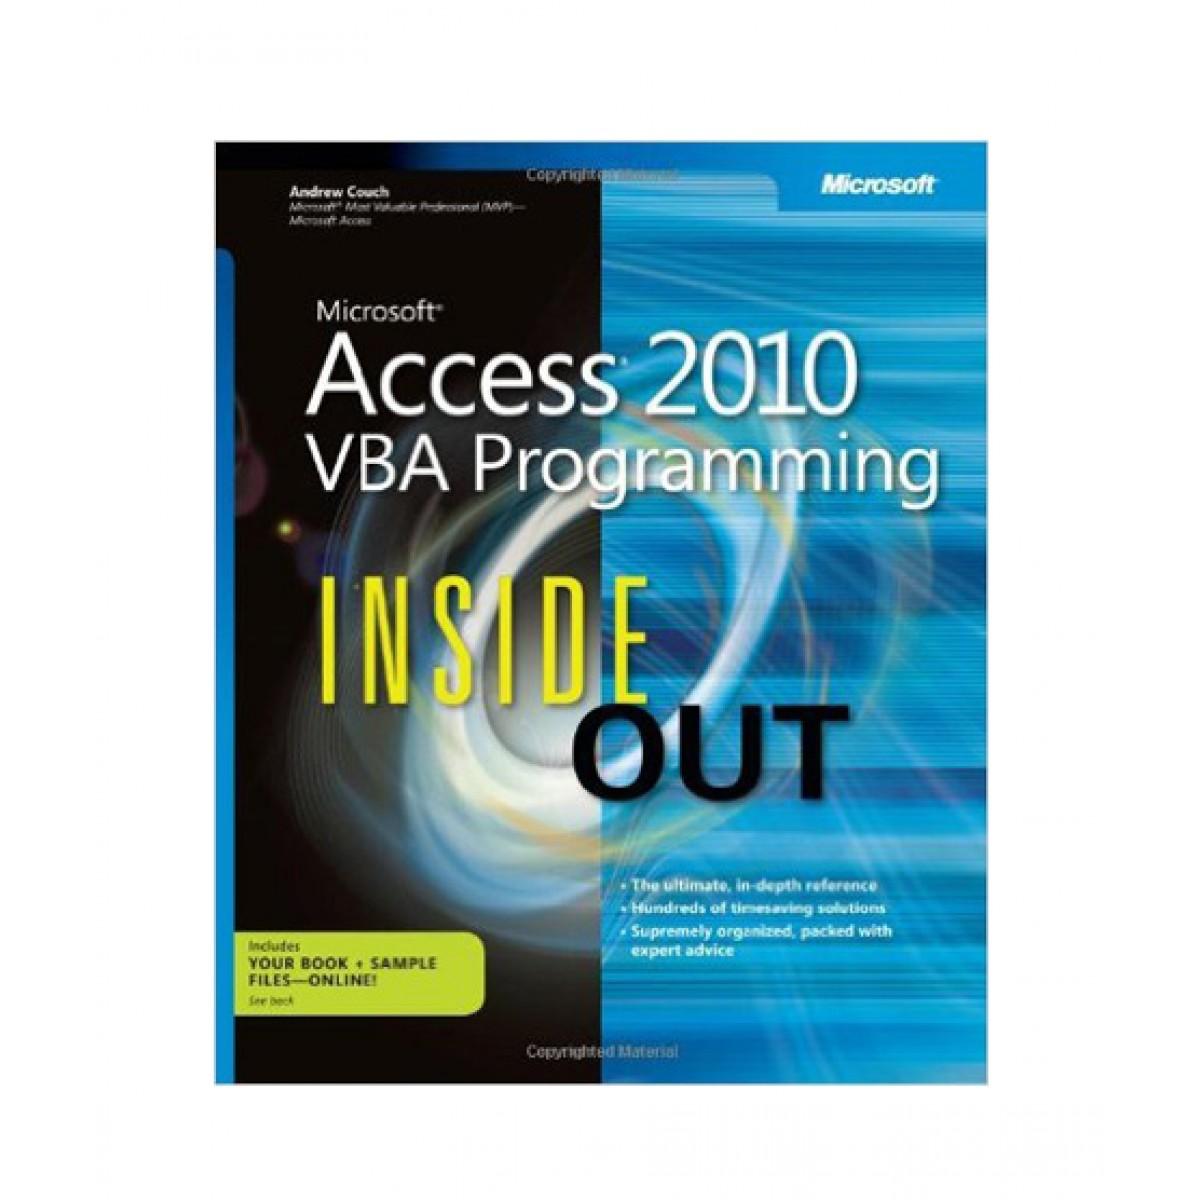 Microsoft Access 2010 VBA Programming Inside Out